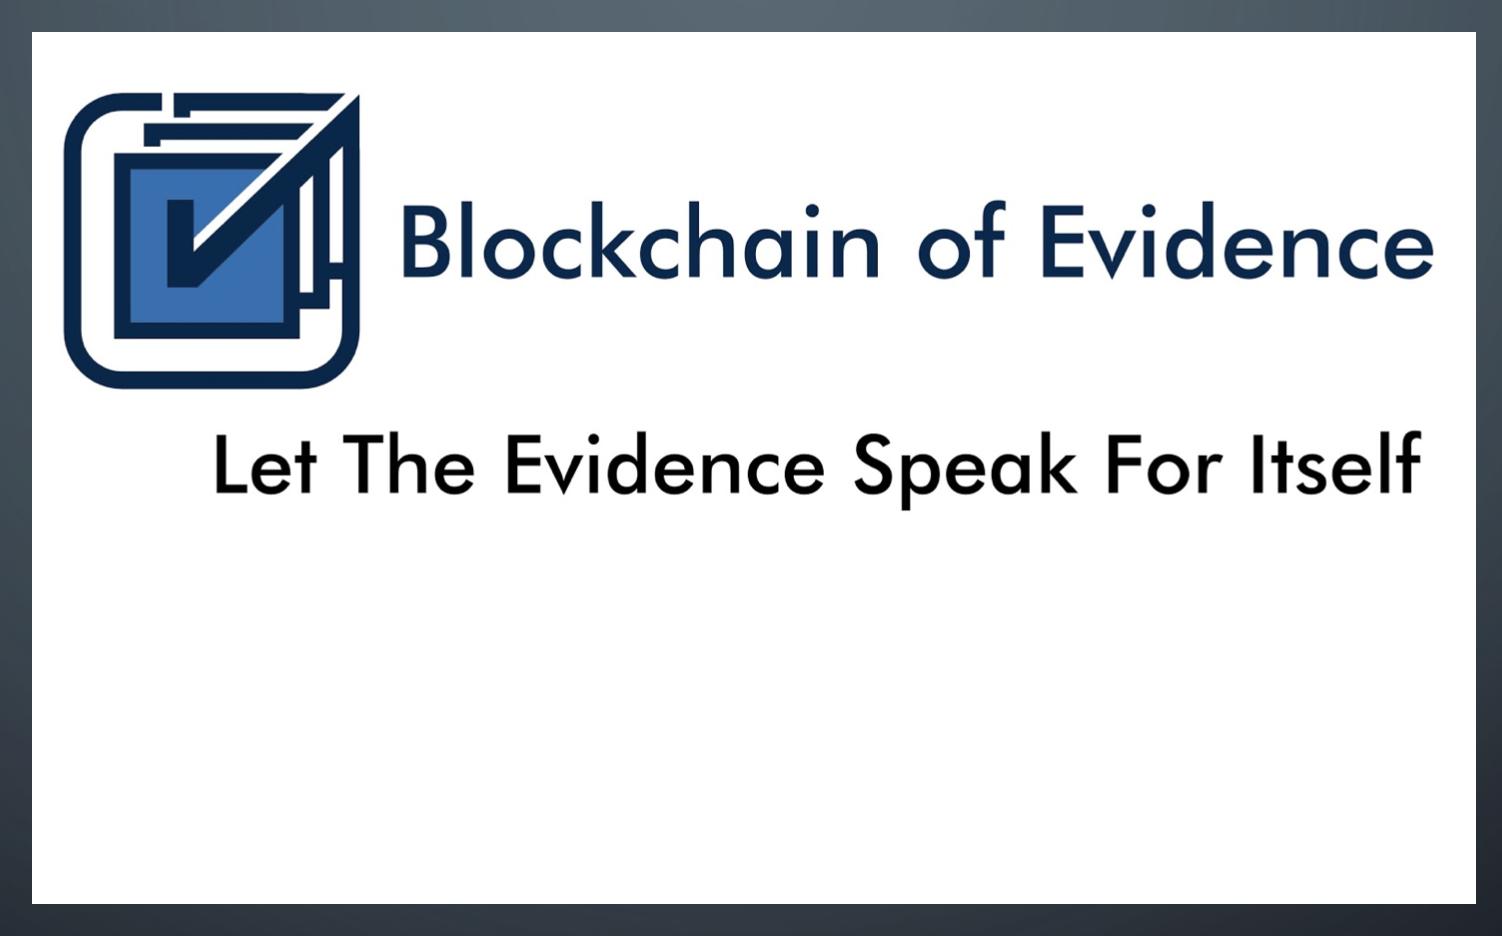 `   Blockchain of Evidence    - SEA 2019 Fellow    Jeff Neithercutt     mentored by  past SEA president Robert Gregoire, CxORE CEO